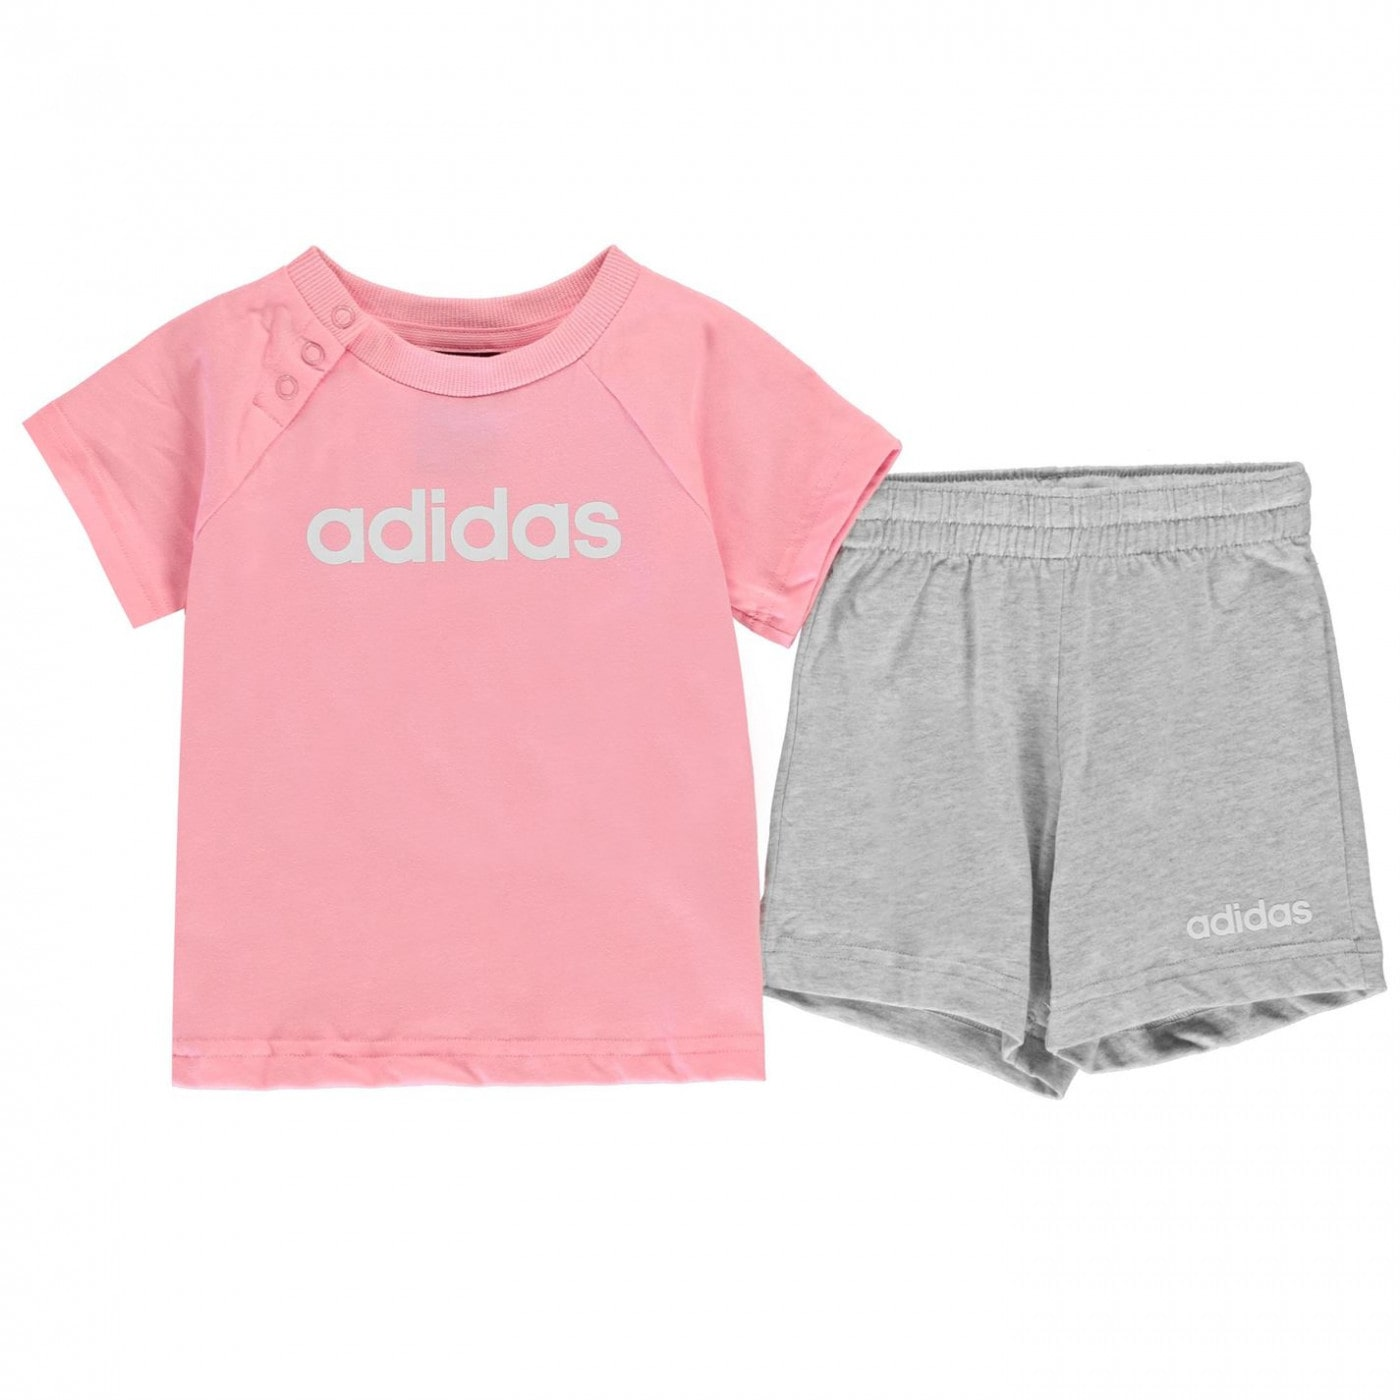 Adidas T Shirt and Shorts Set Baby Girls